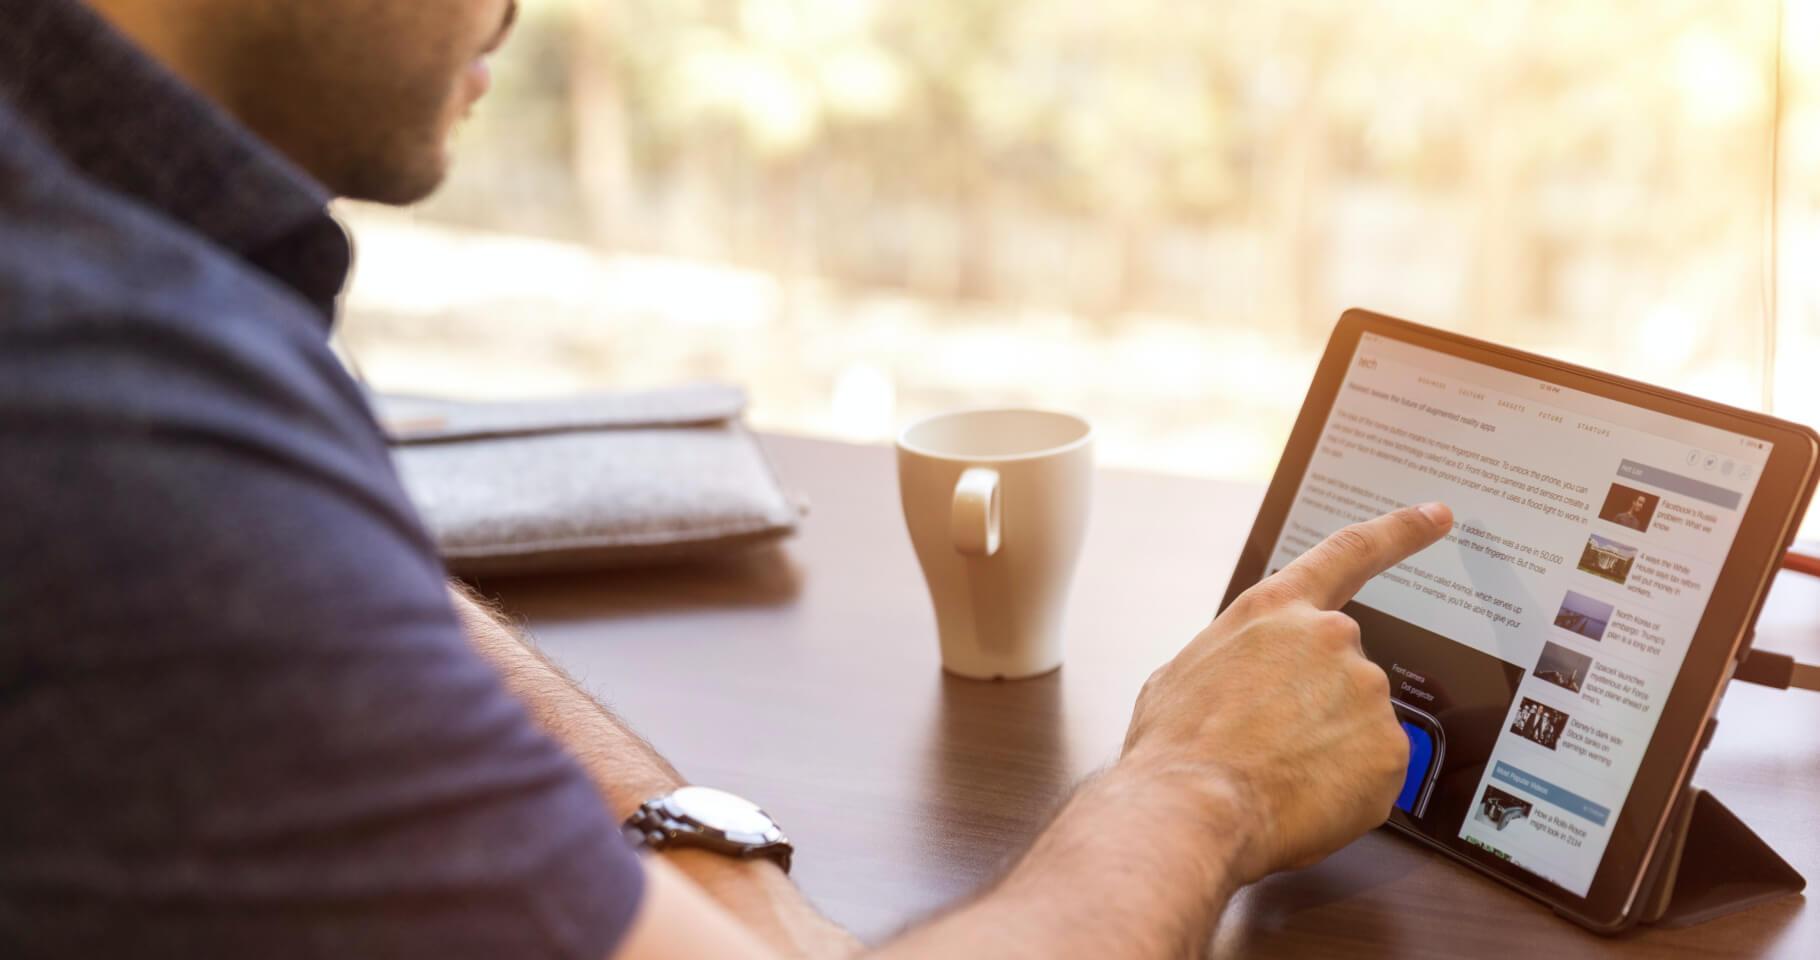 3 factores a considerar al decidir estudiar online